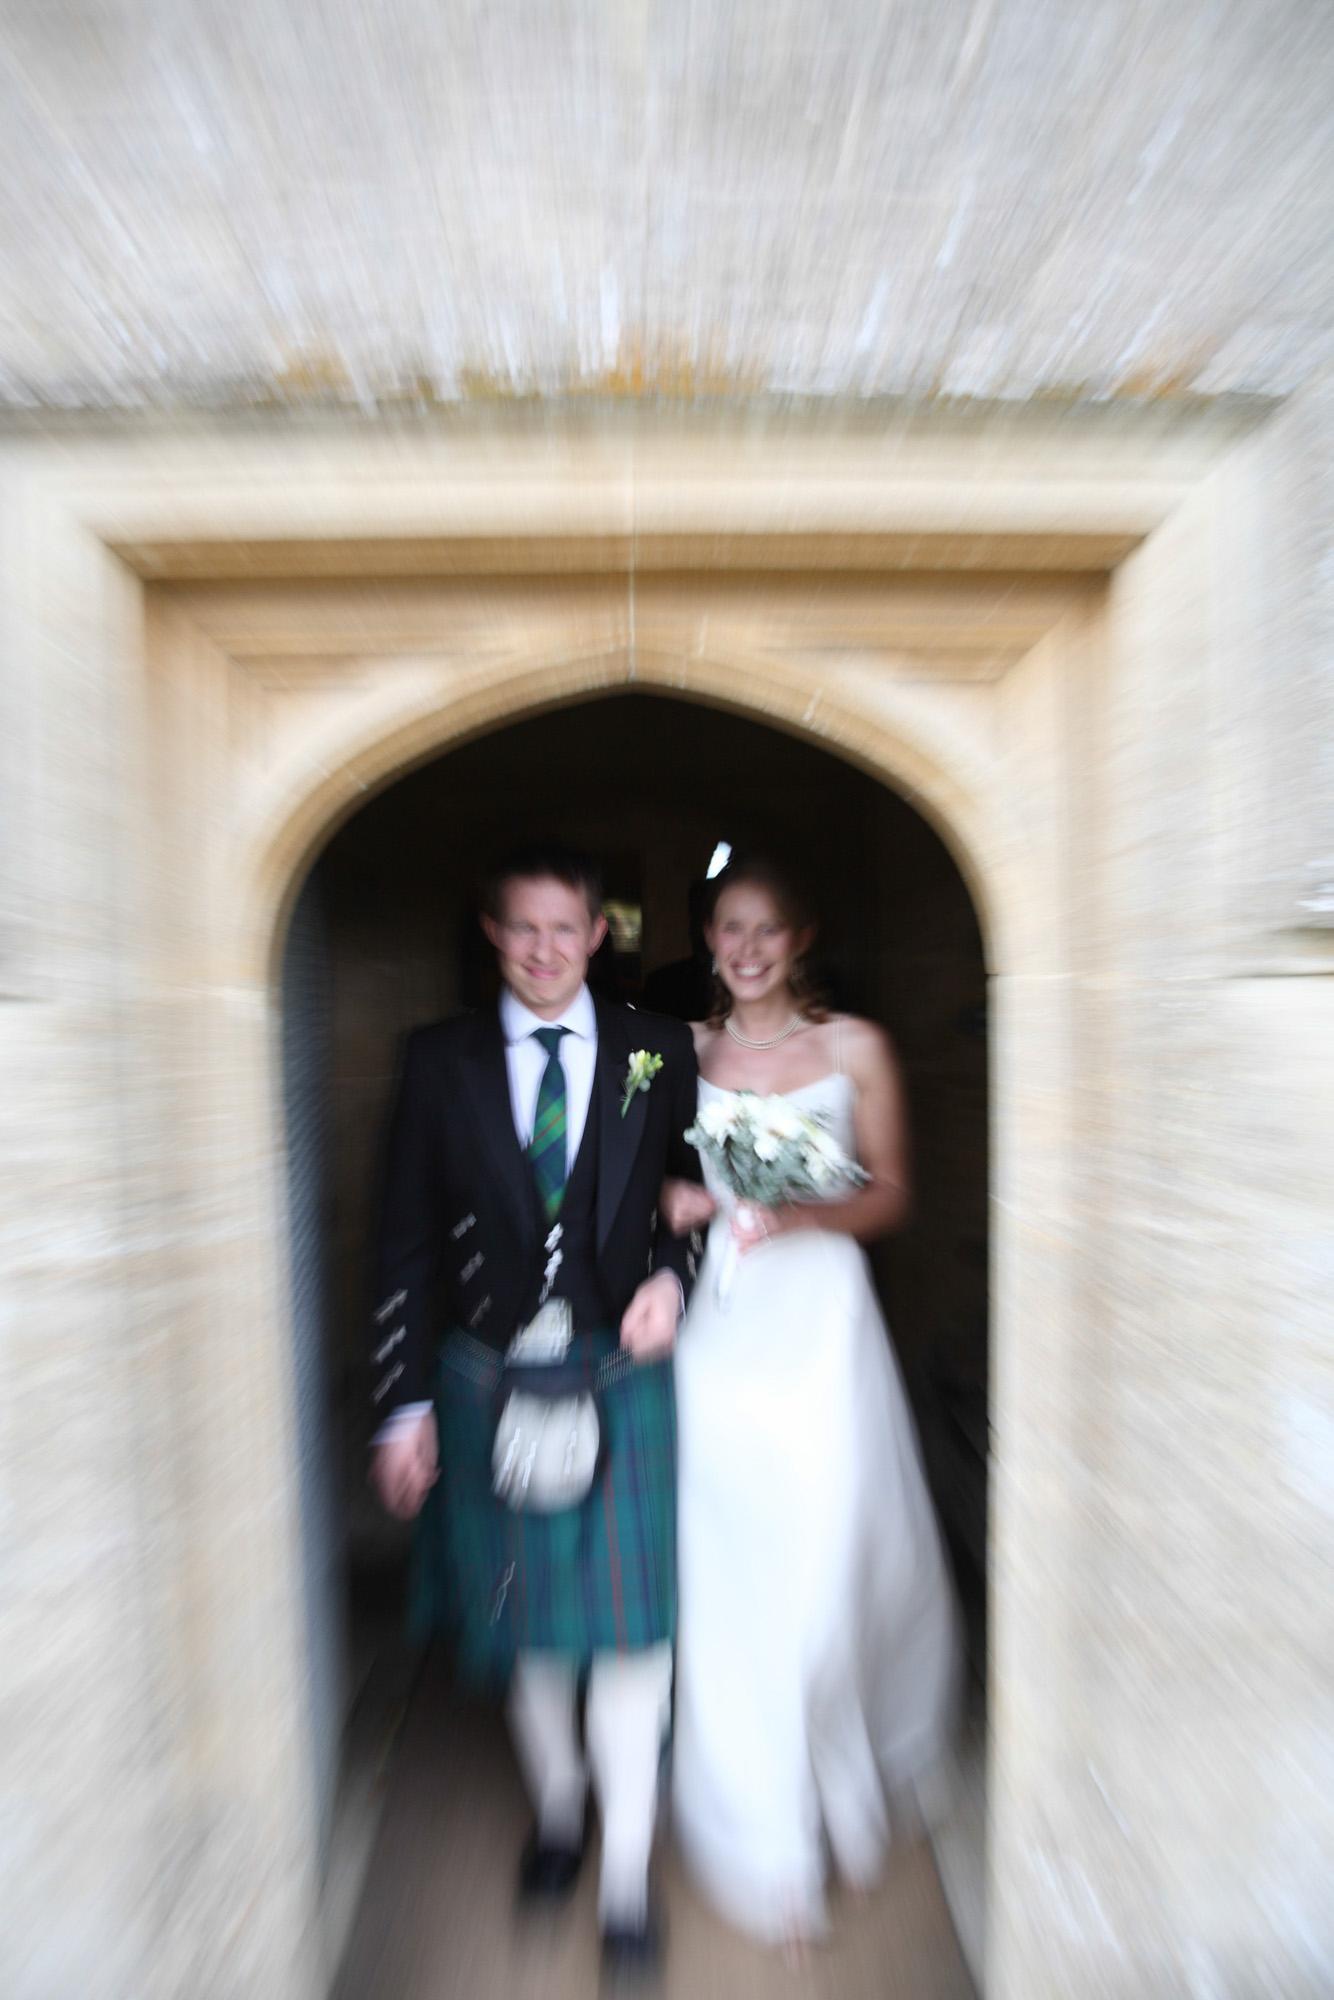 weddings-couples-love-photographer-oxford-london-jonathan-self-photography-43.jpg